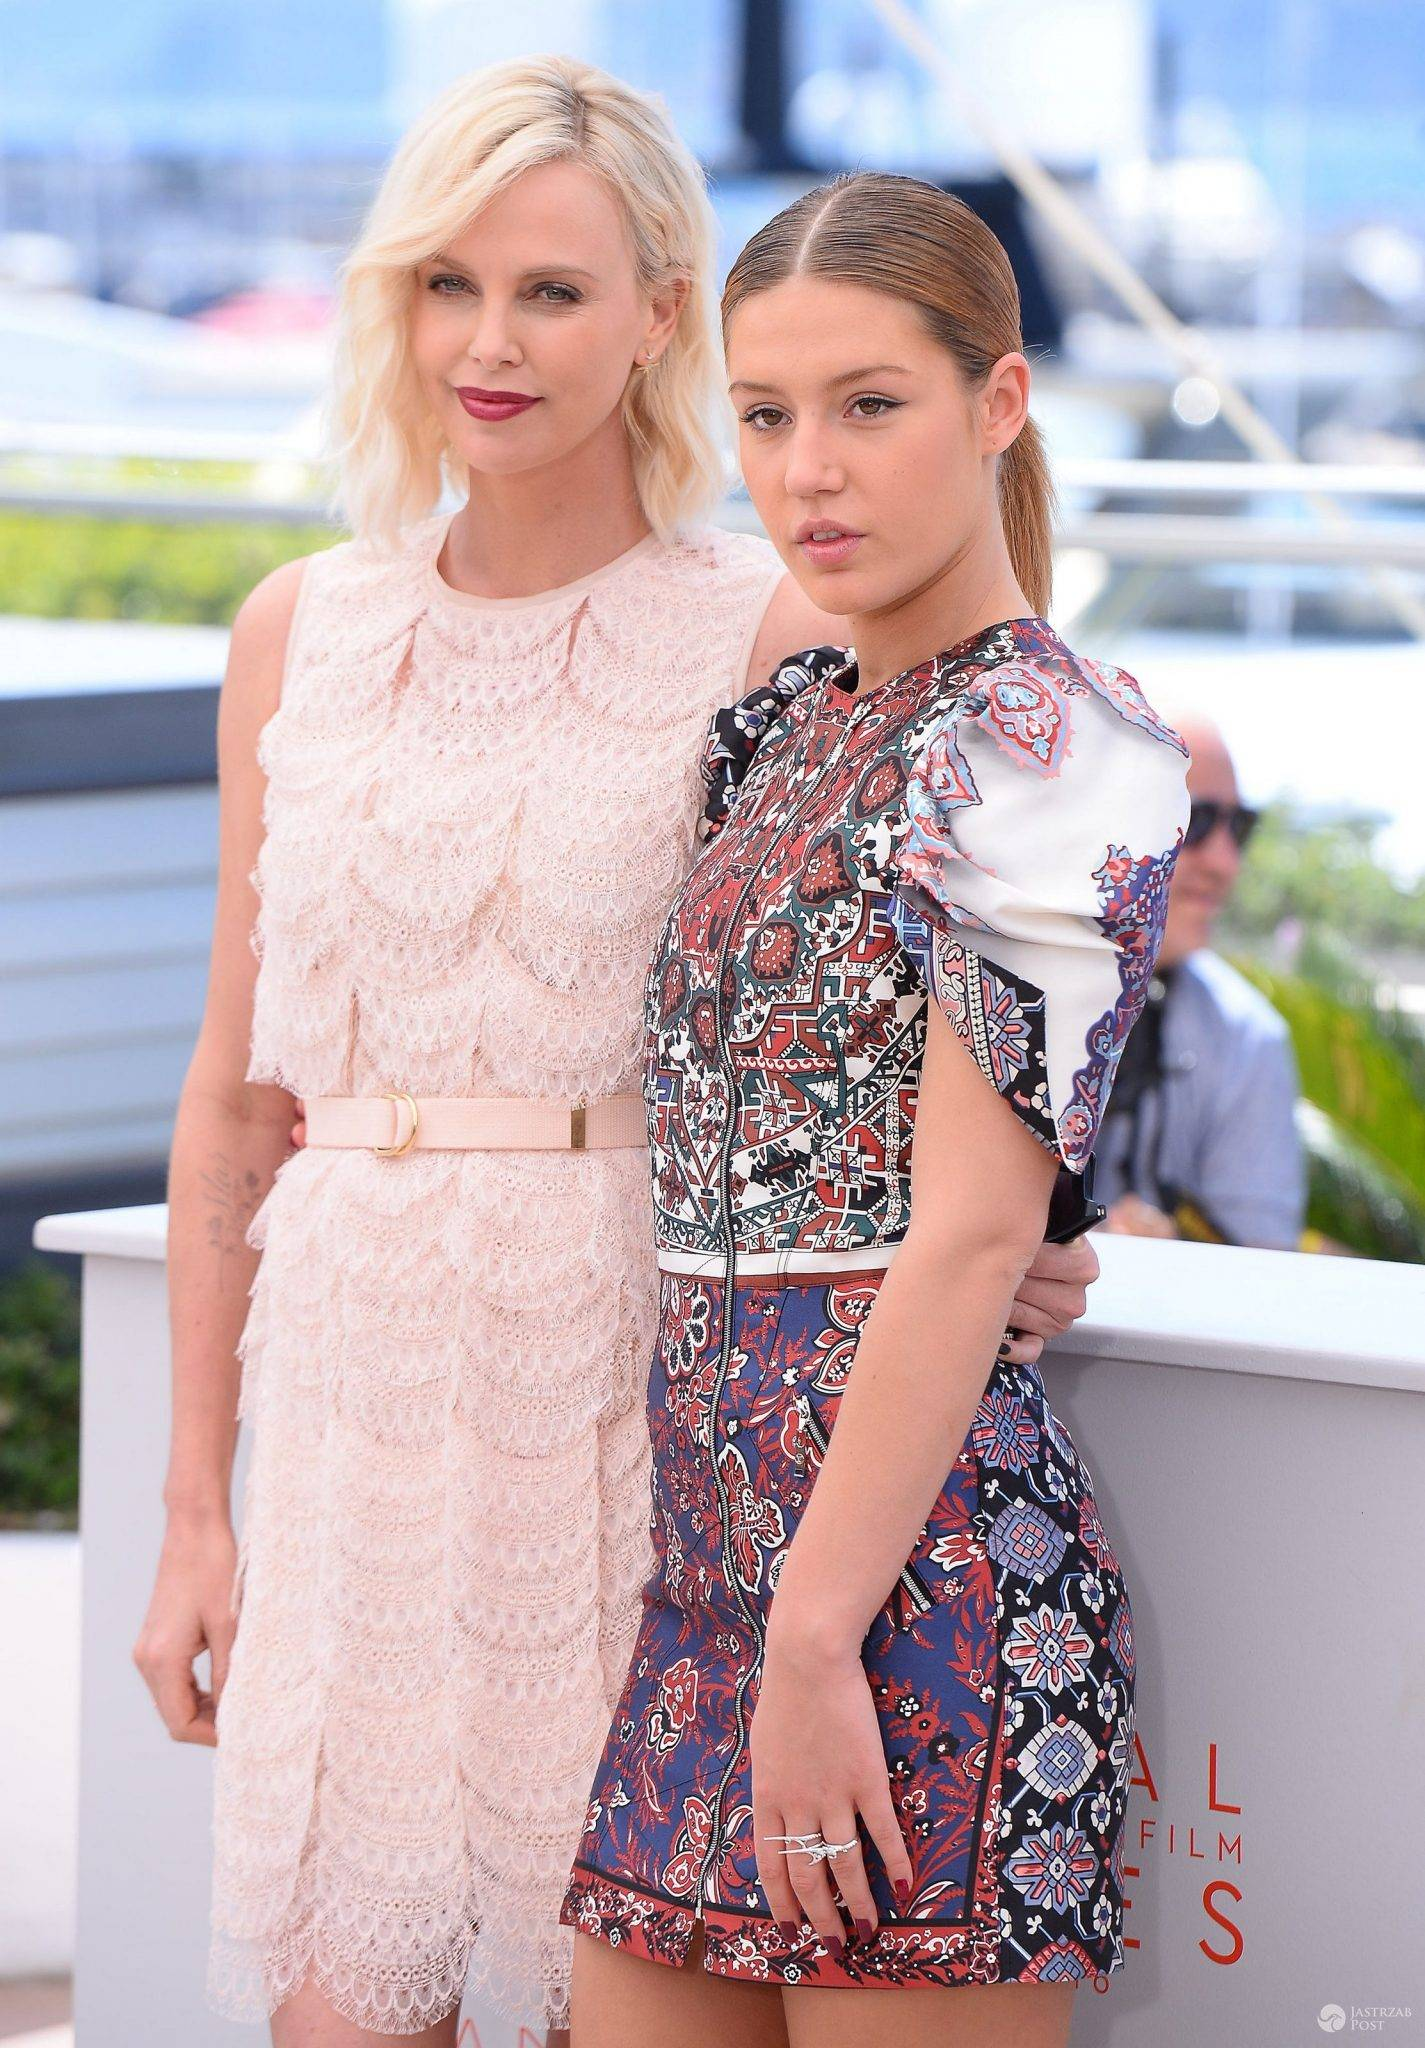 "Charlize Theron i Adèle Exarchopoulos, gwiazdy filmu ""The Last Face"" na festiwalu w Cannes 2016 (fot. ONS)"